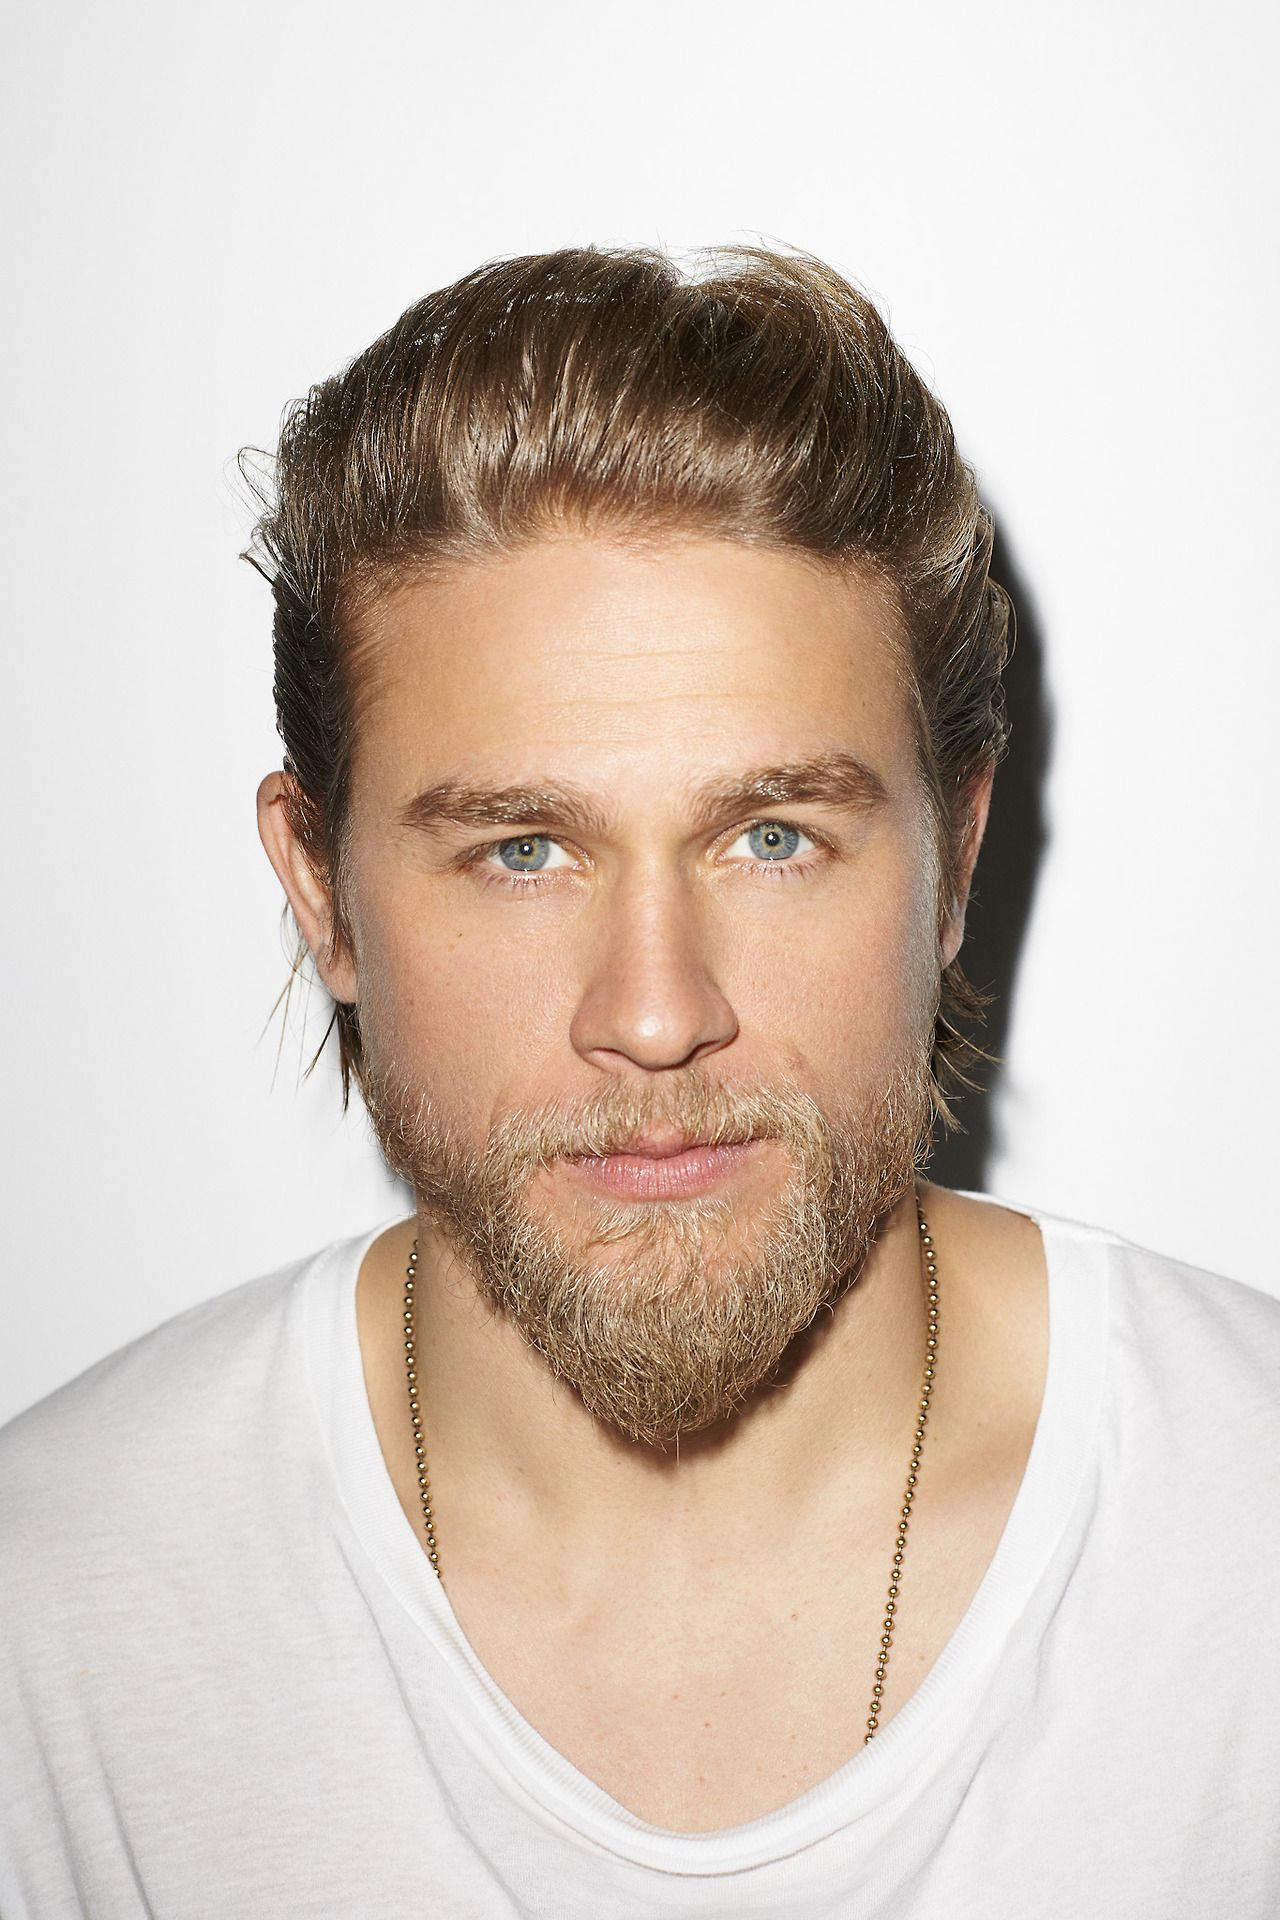 Pin By Vanessa Marie On Celebrities Beard Styles Beard Styles For Men Ducktail Beard